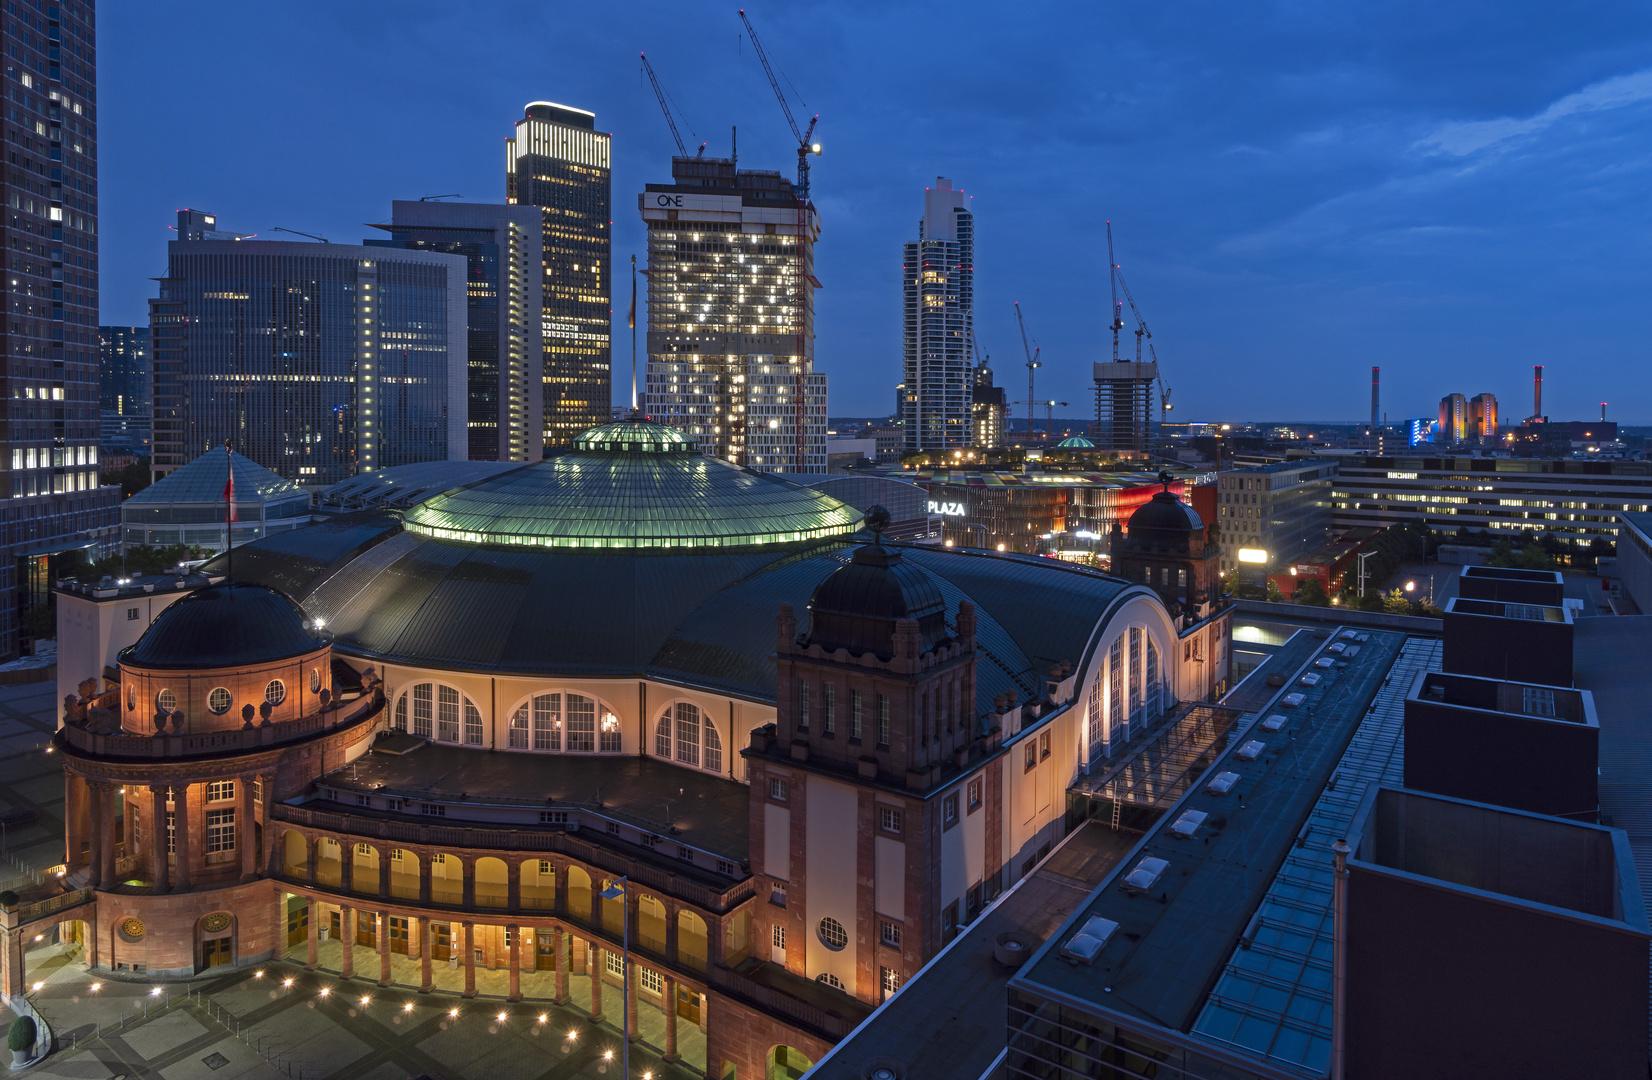 Blick auf Festhalle Frankfurt